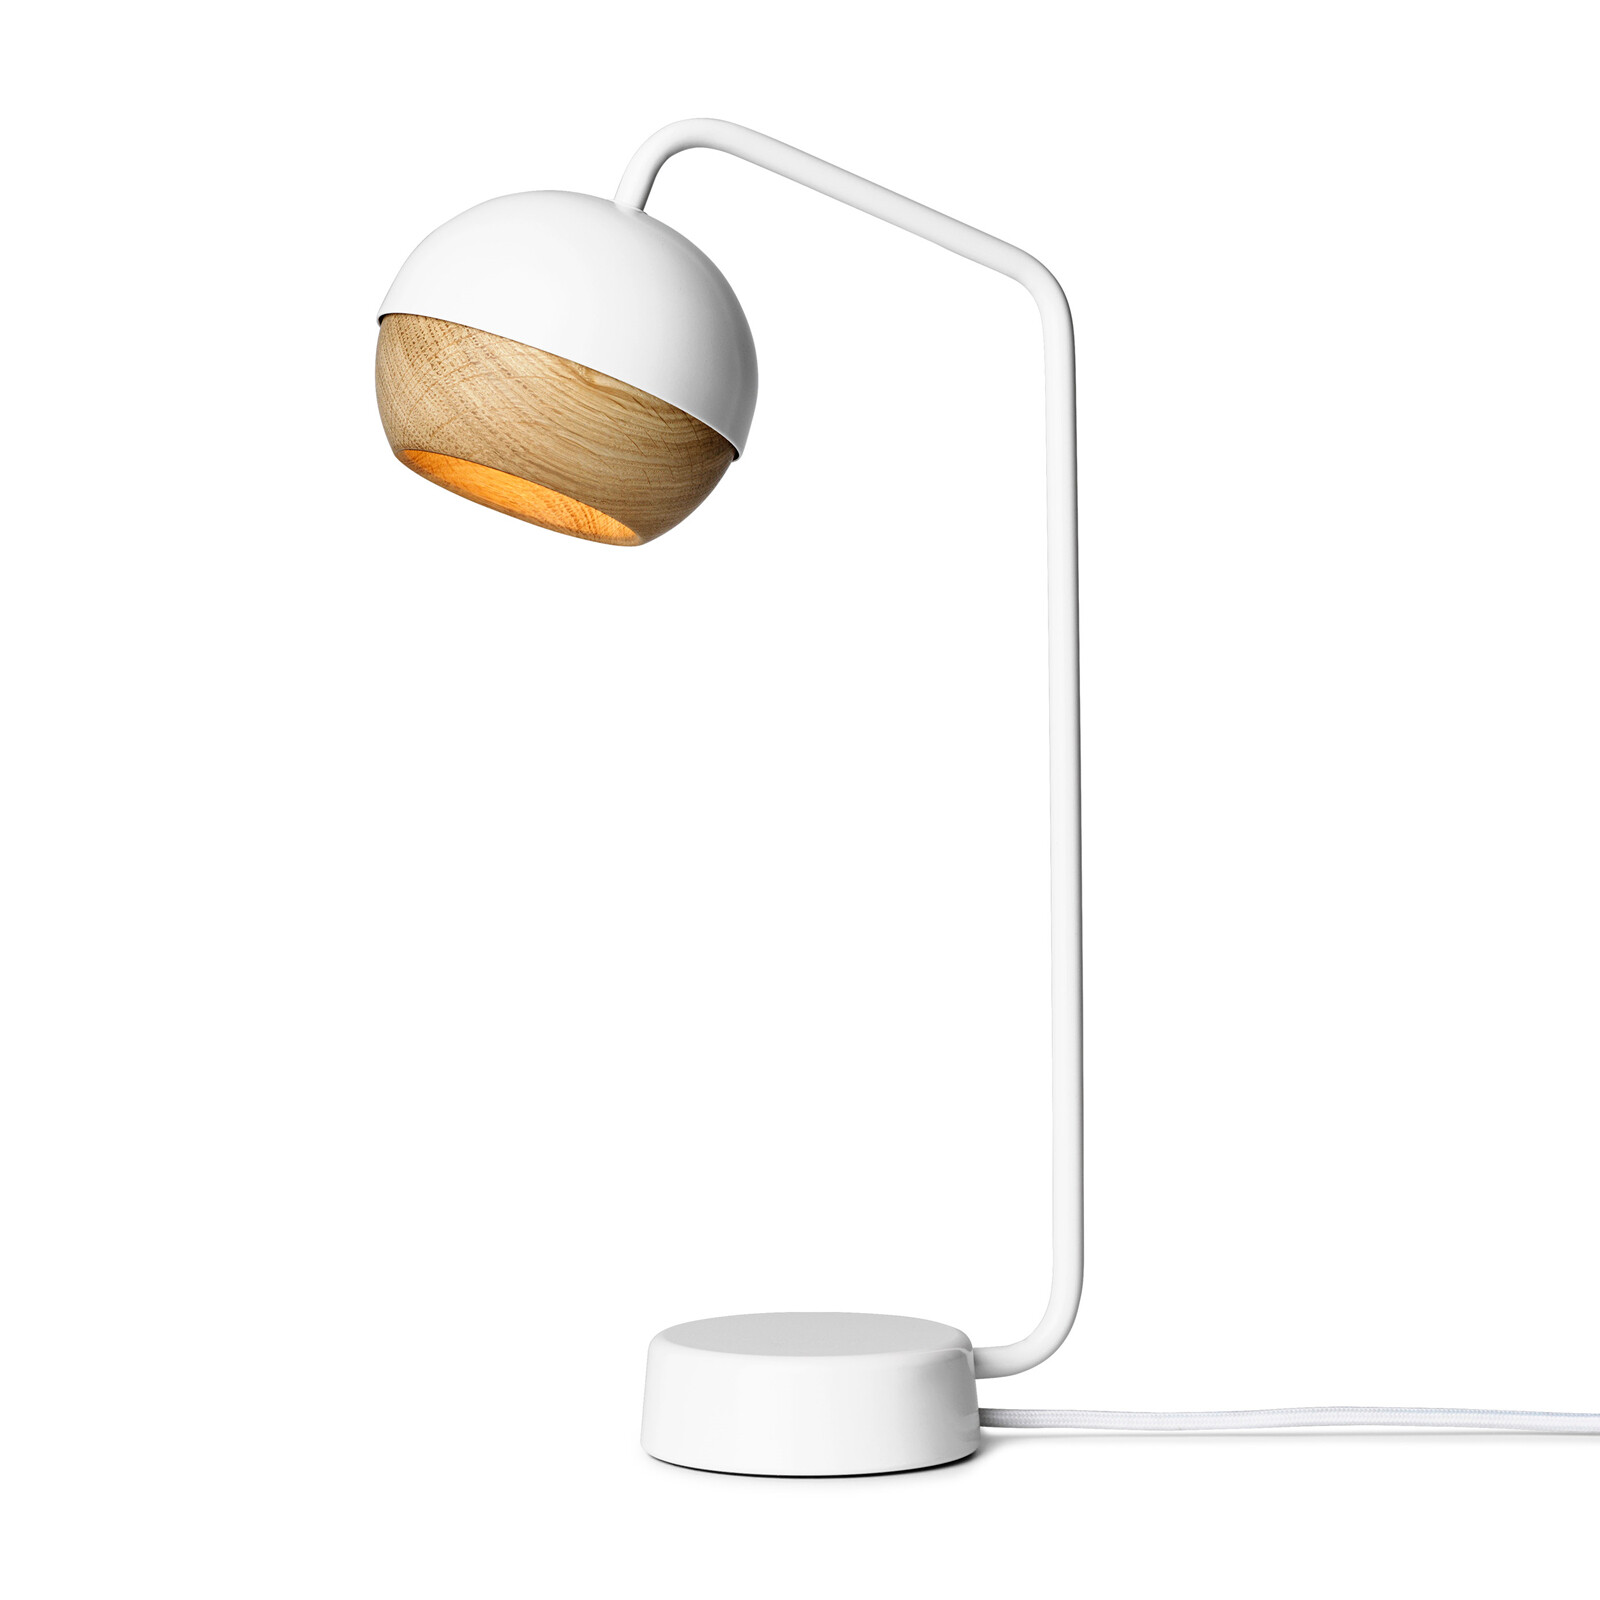 Ray Bordlampe Hvid - Mater thumbnail